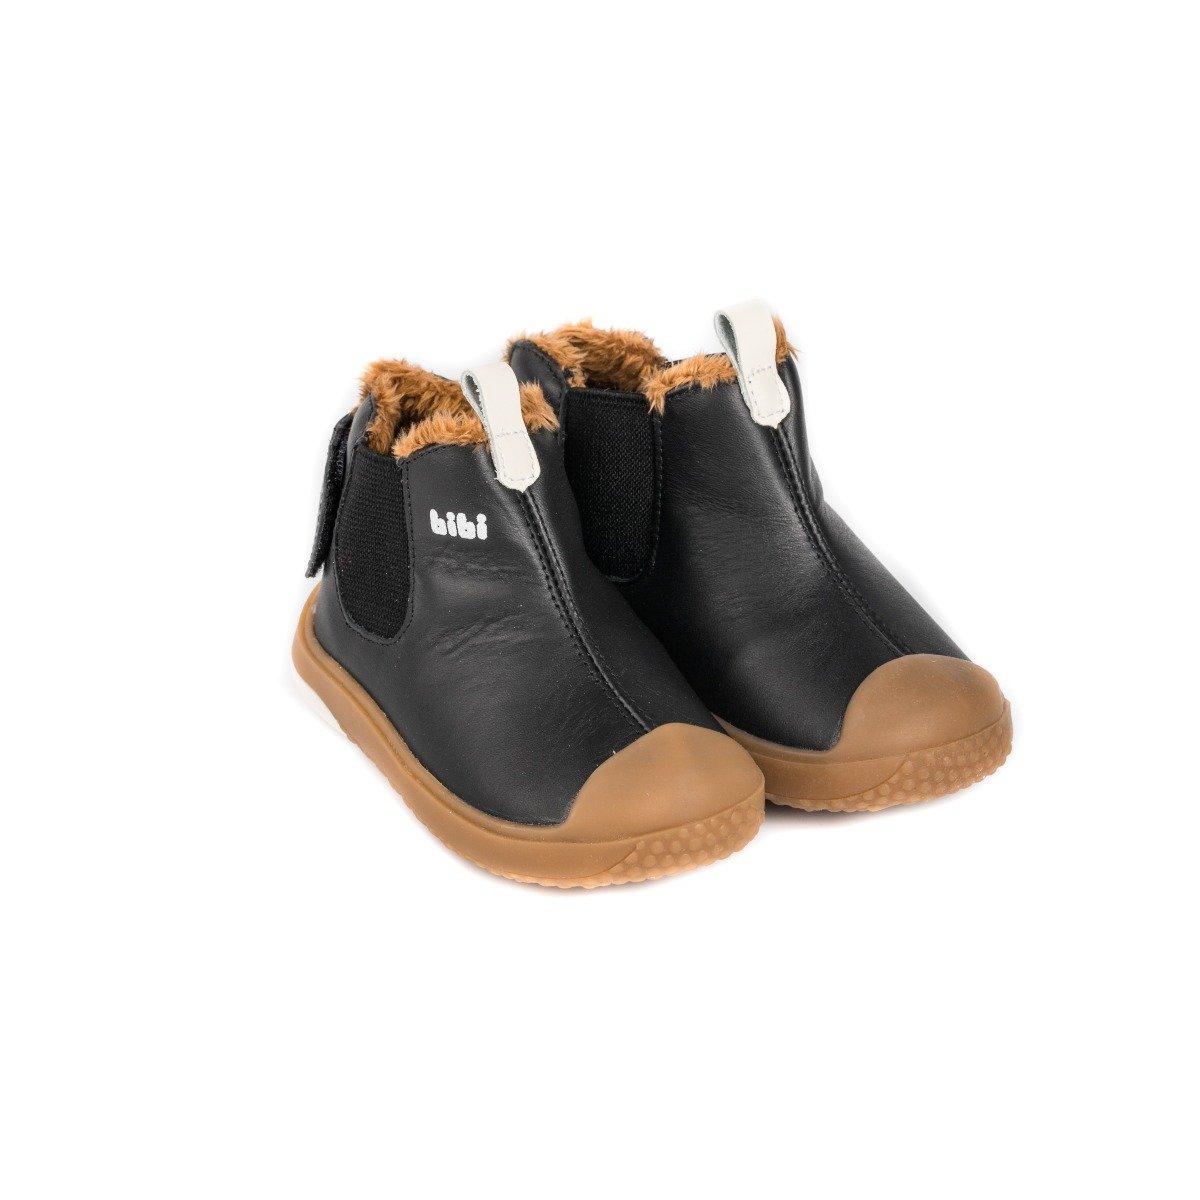 Ghete cu blanita Bibi Shoes Prewalker Black imagine 2021